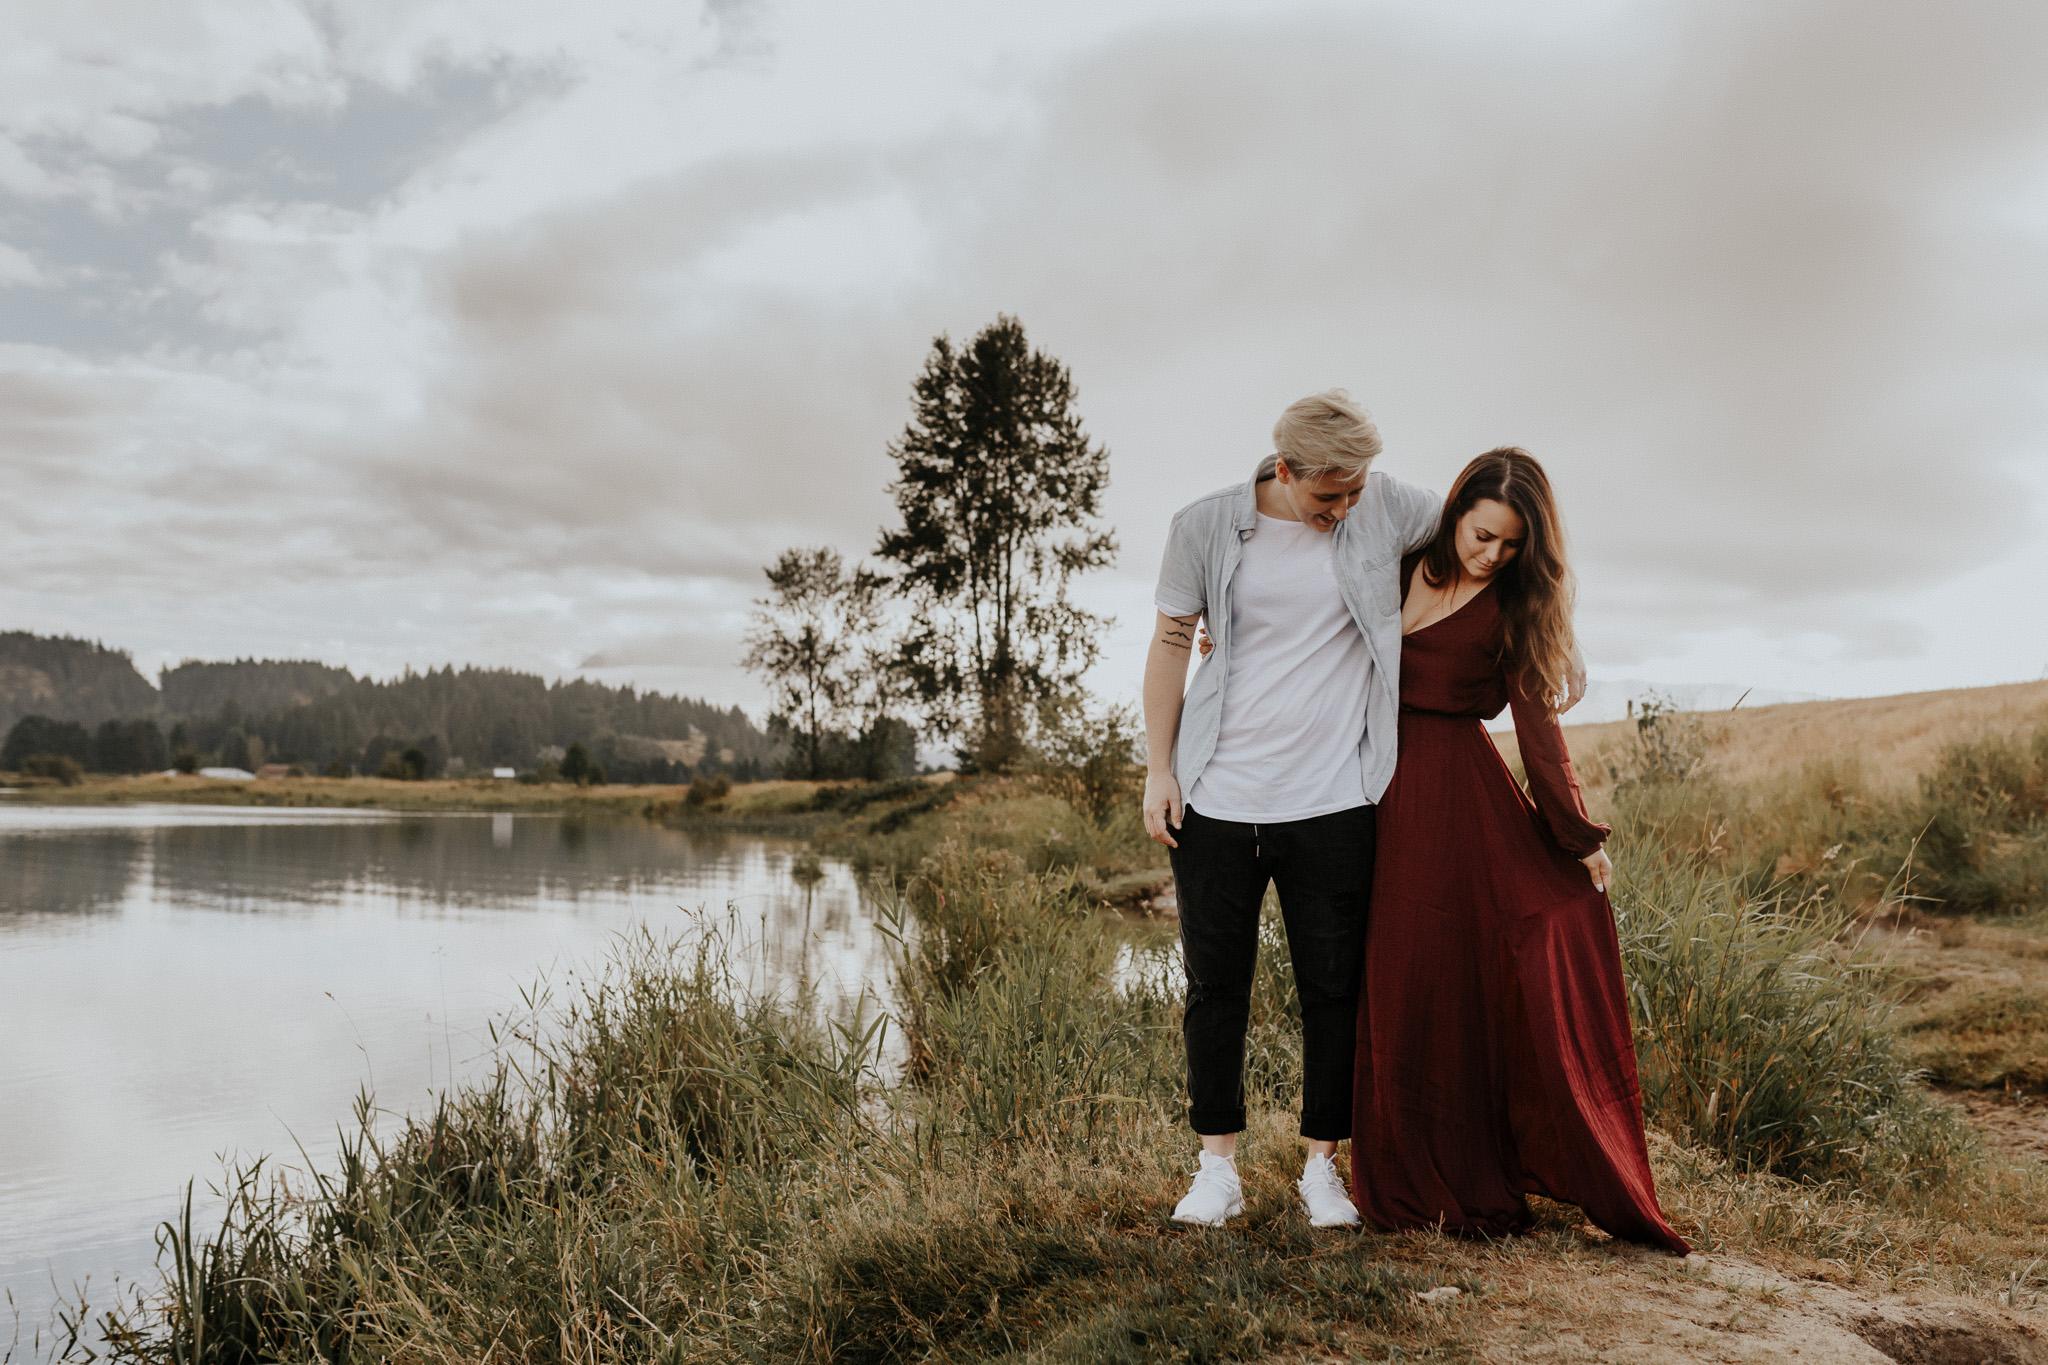 vancouver wedding photographer - lifestyle engagement session-22.jpg